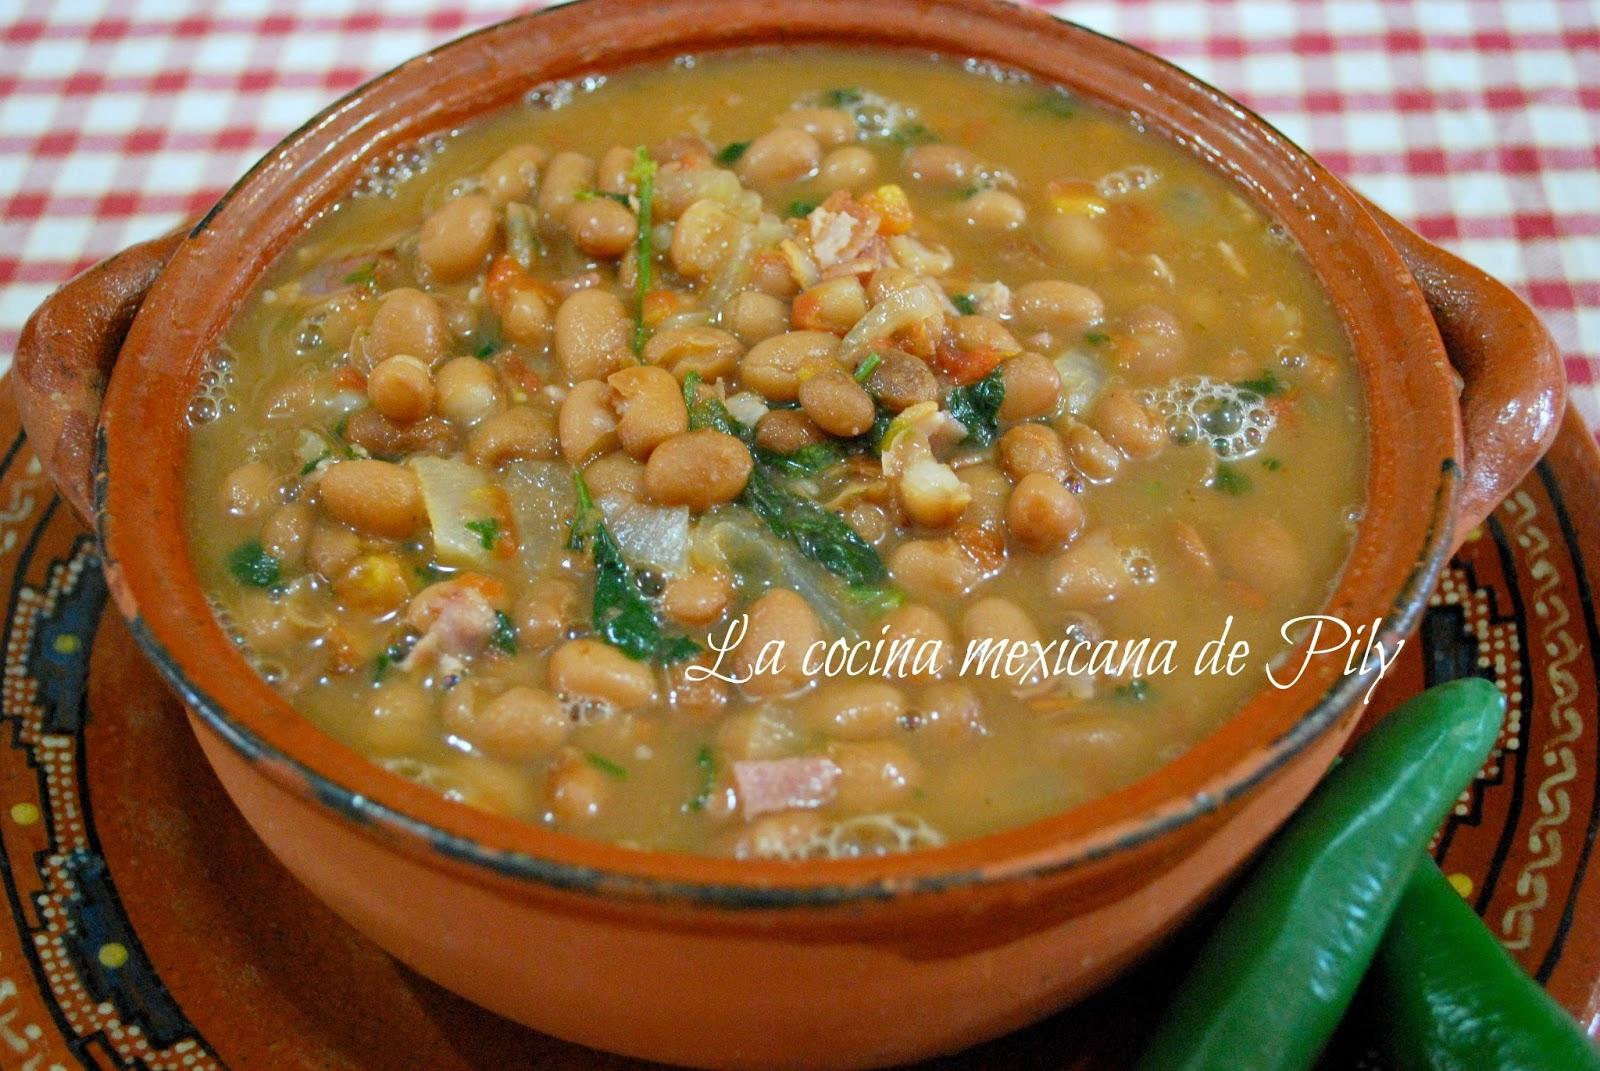 frijoles la cocina mexicana de pily